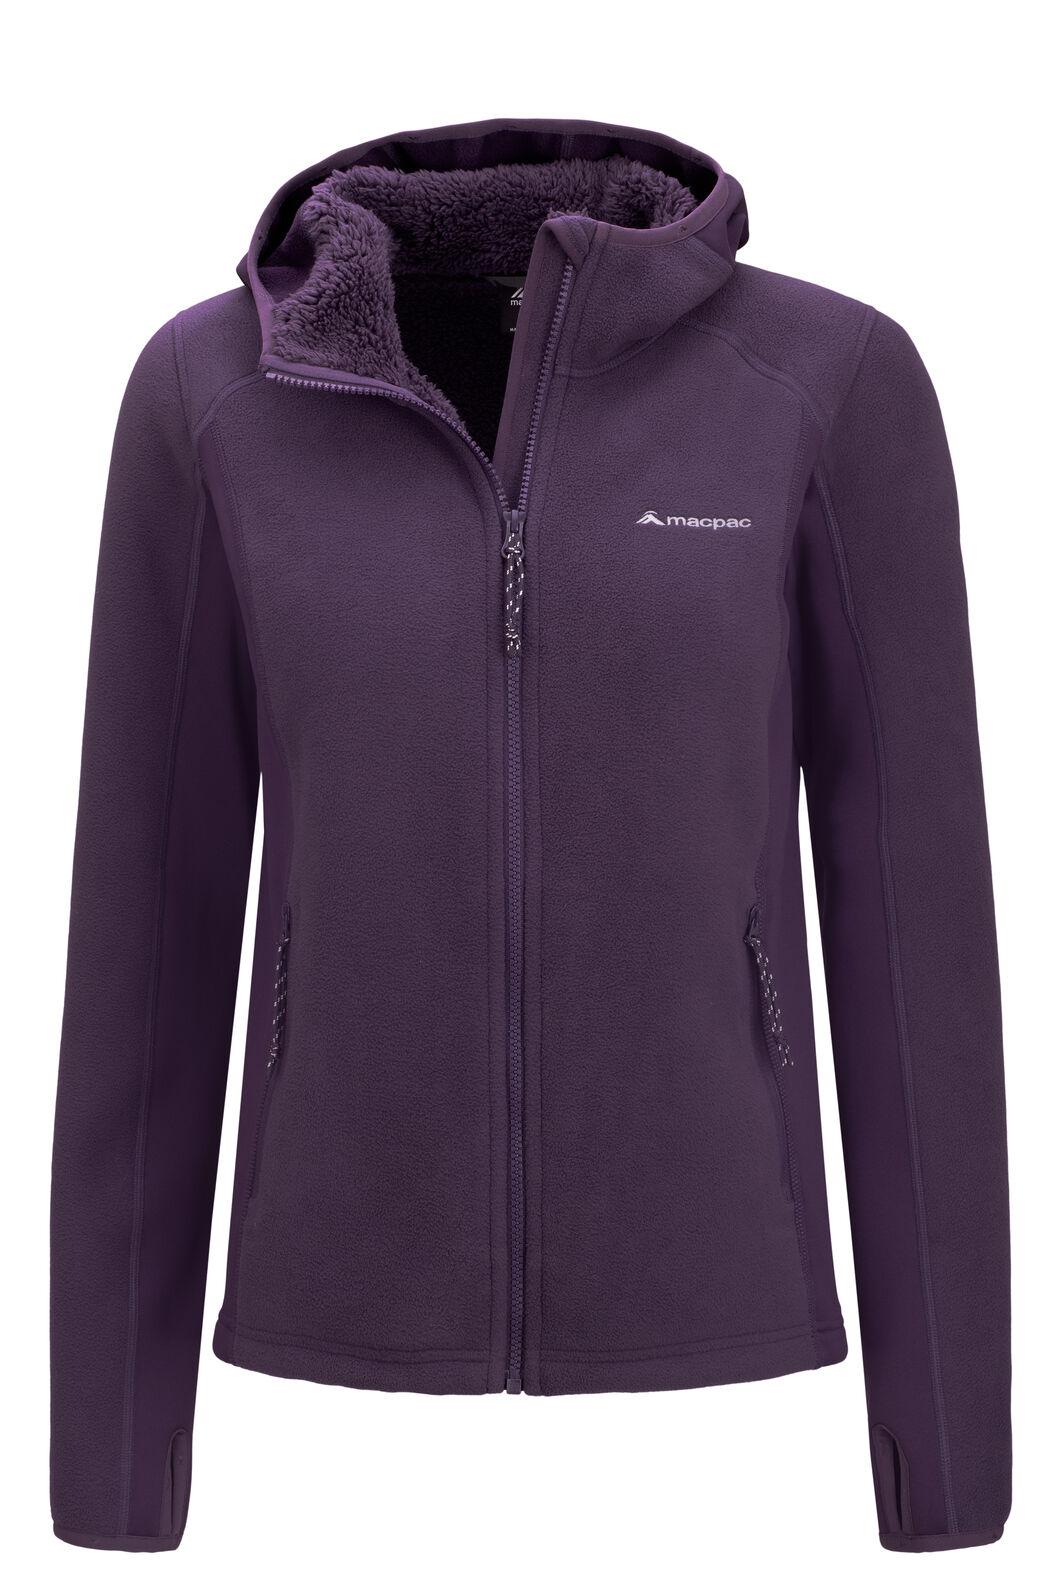 Macpac Mountain Hooded Jacket — Women's, Nightshade, hi-res